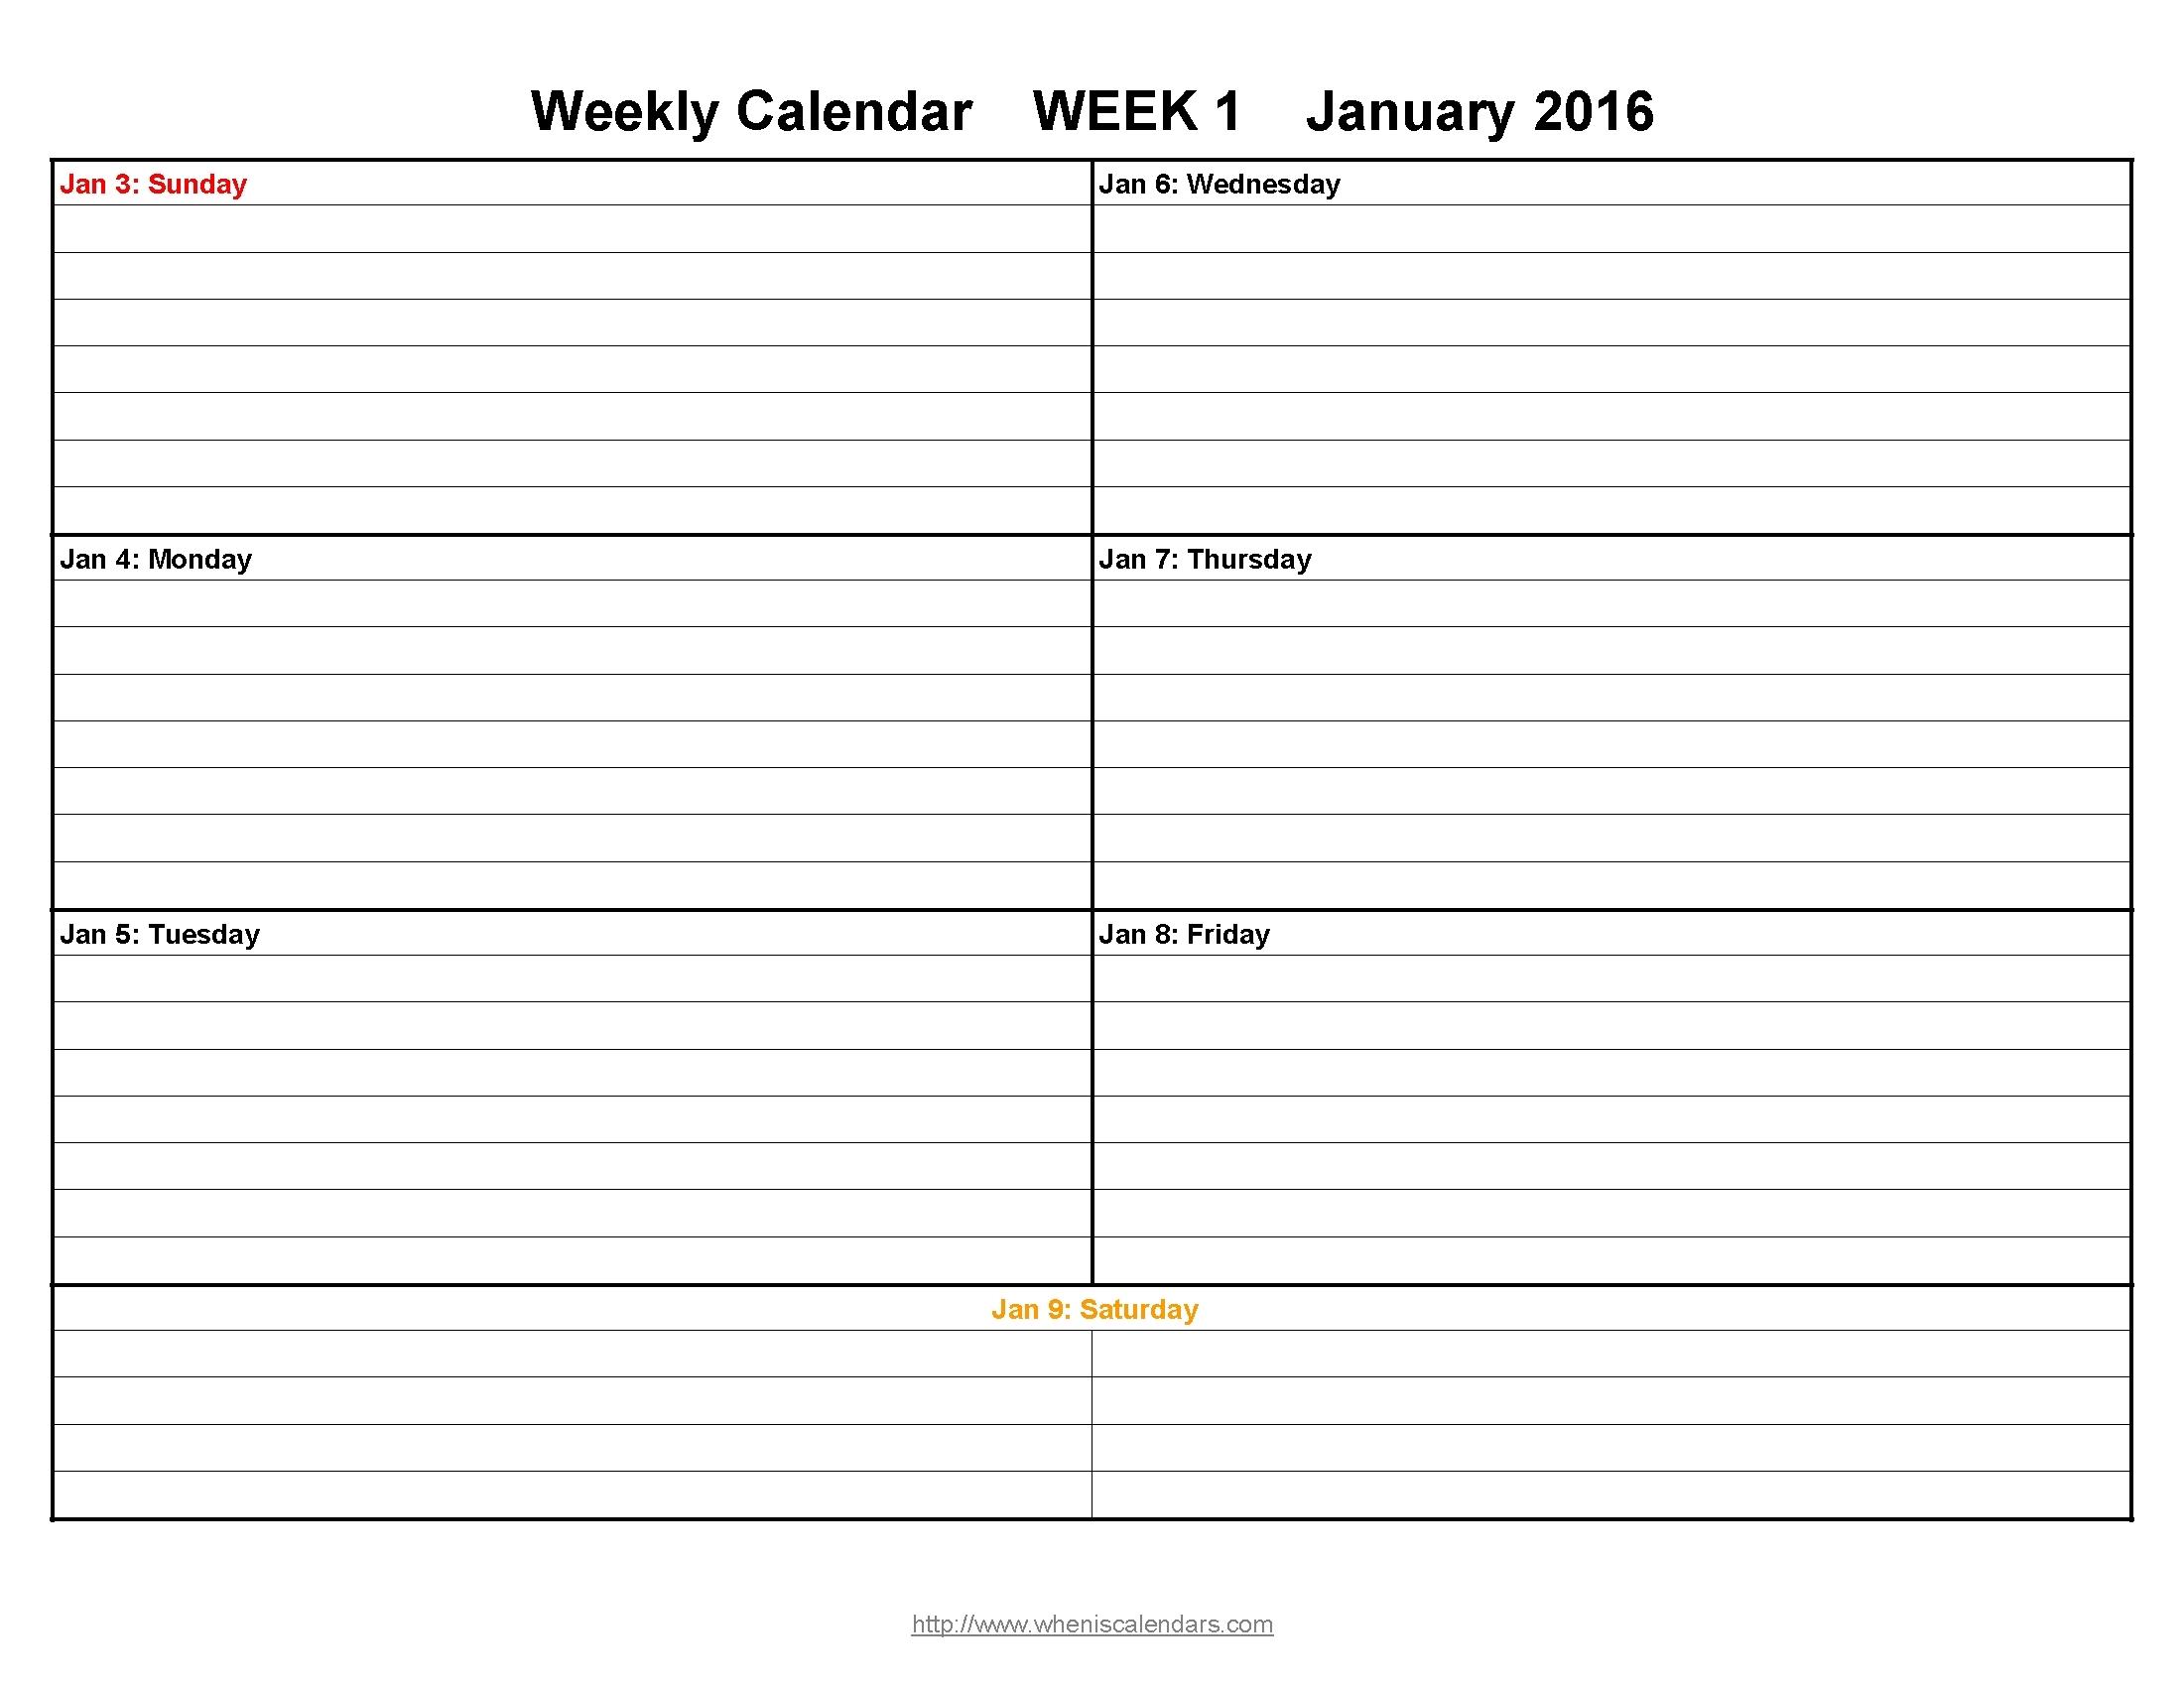 Printable Calendar Room For Notes   Jazz Gear Calendar Template With Room For Notes